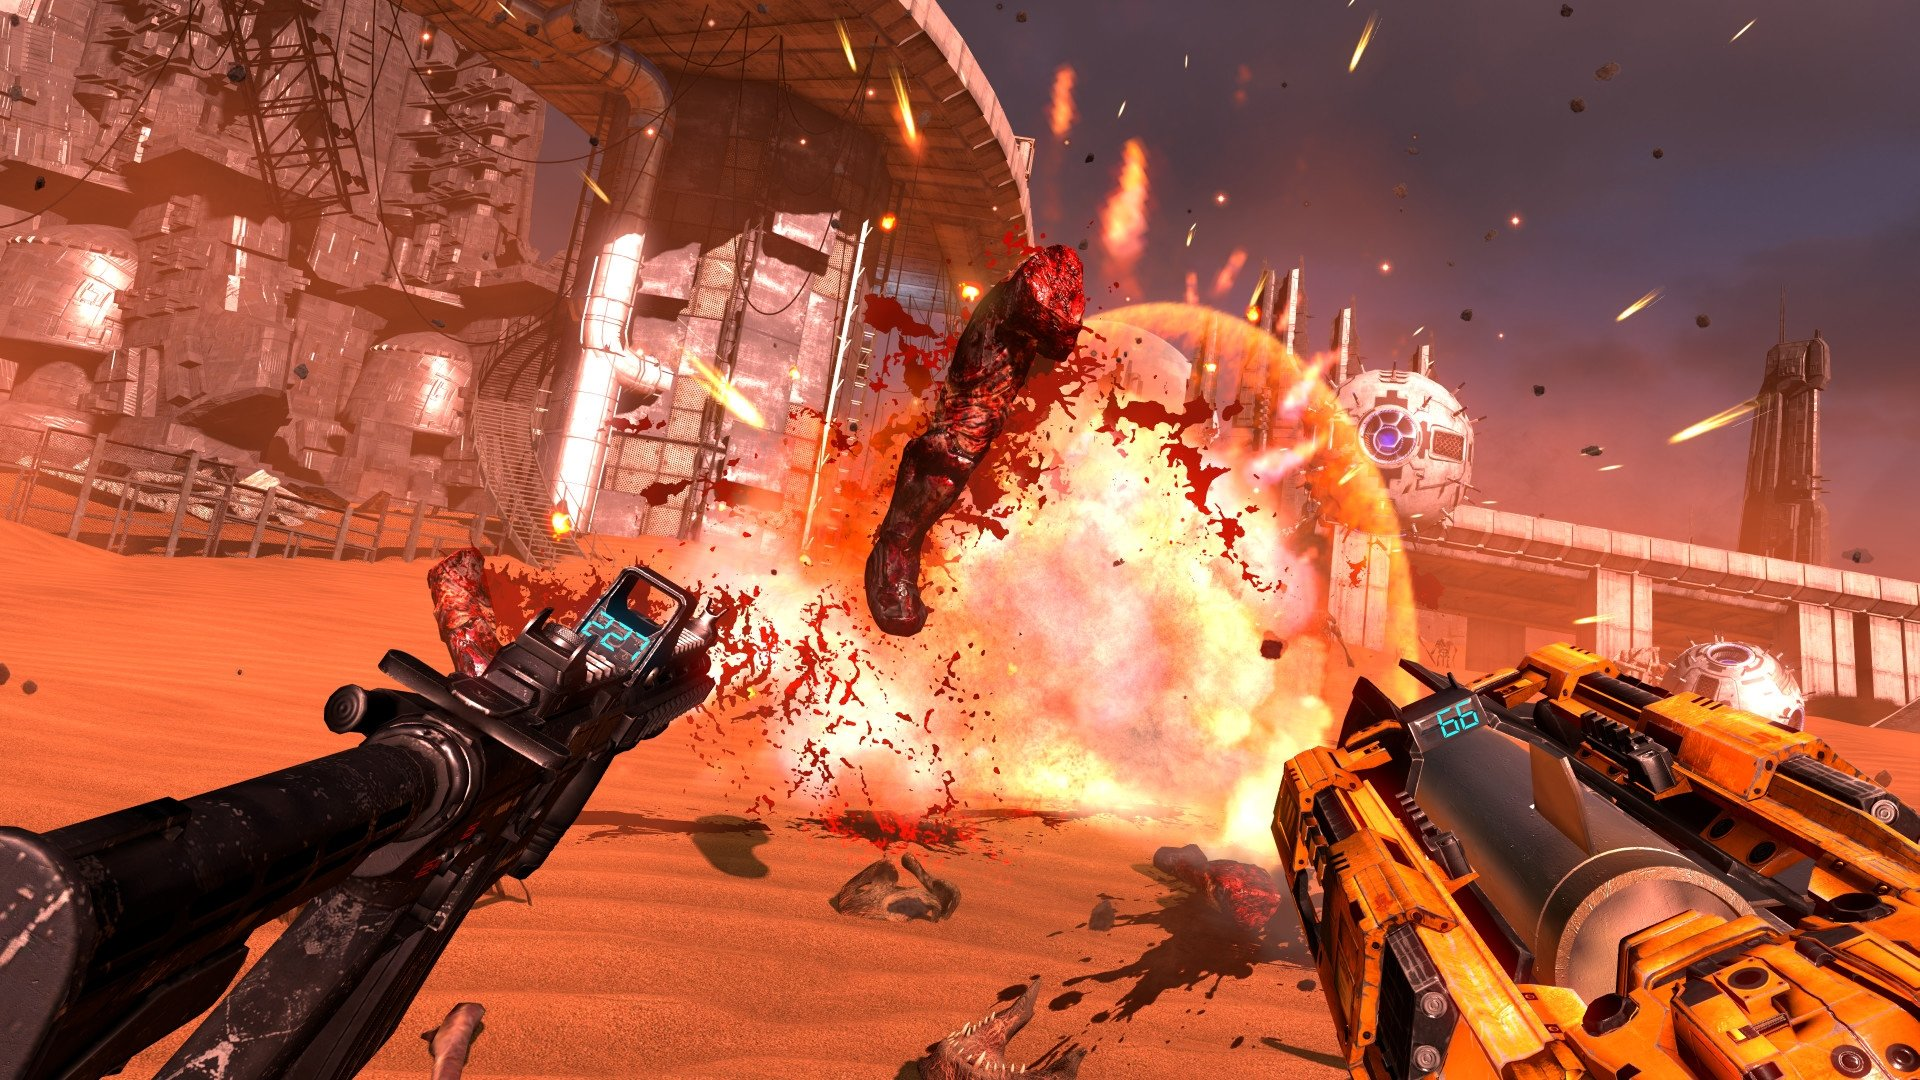 В Steam появился ремейк Serious Sam для VR-шлемов